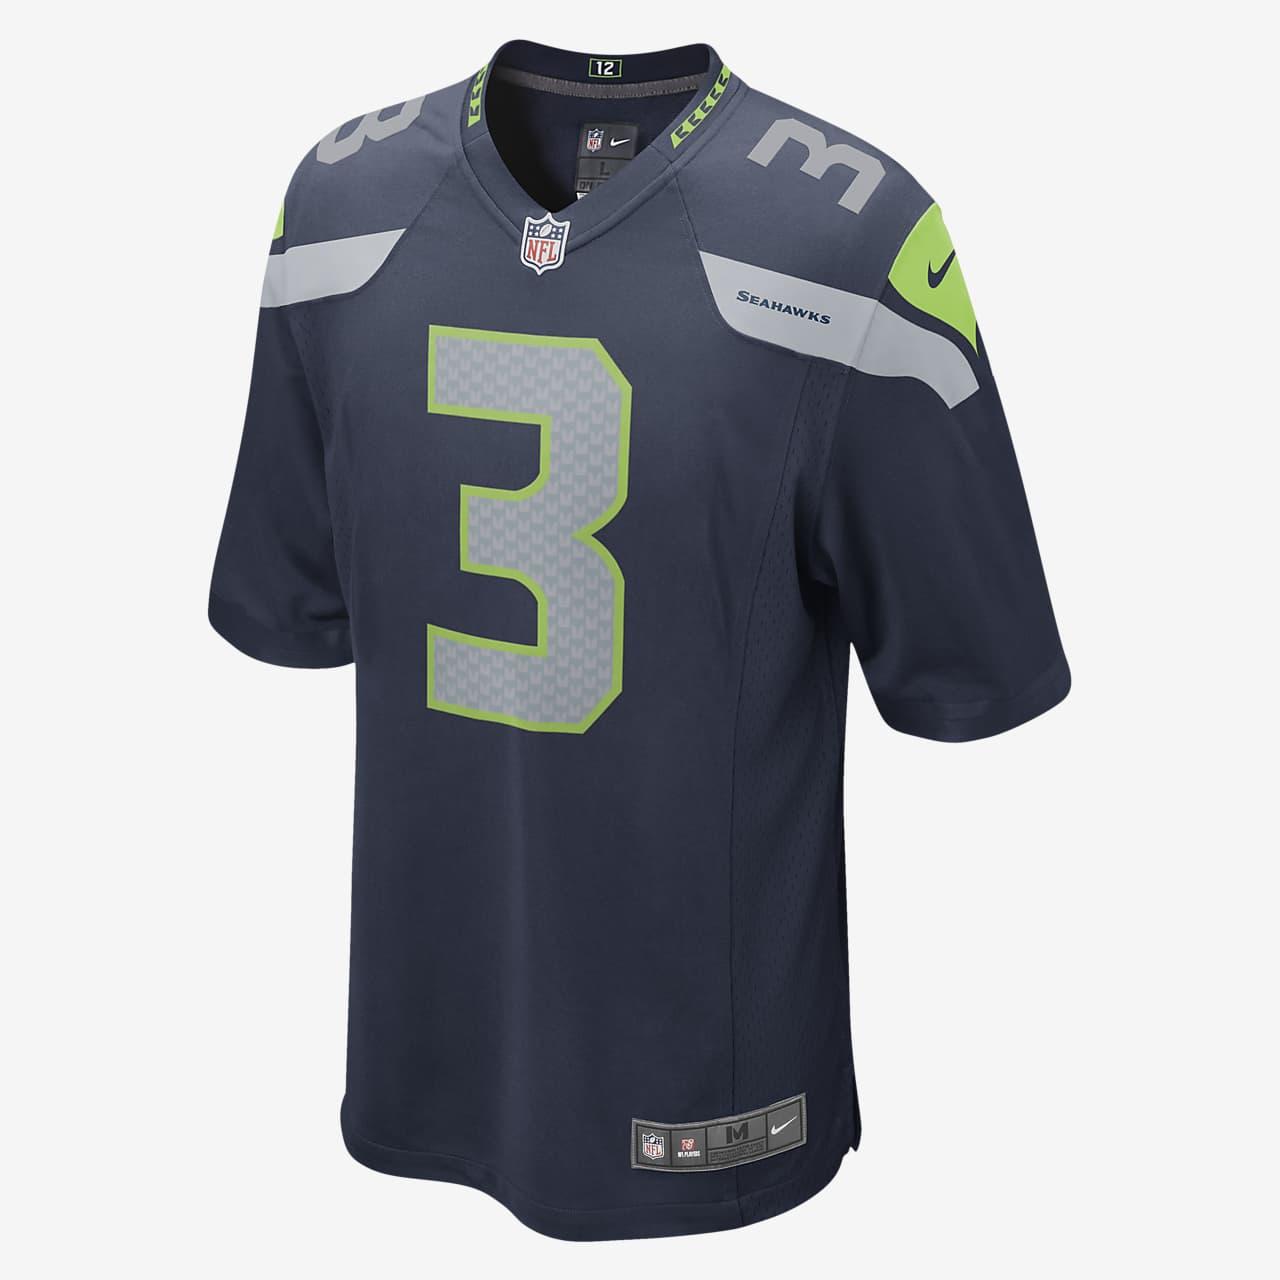 NFL Seattle Seahawks (Russell Wilson) American football-thuiswedstrijdjersey heren